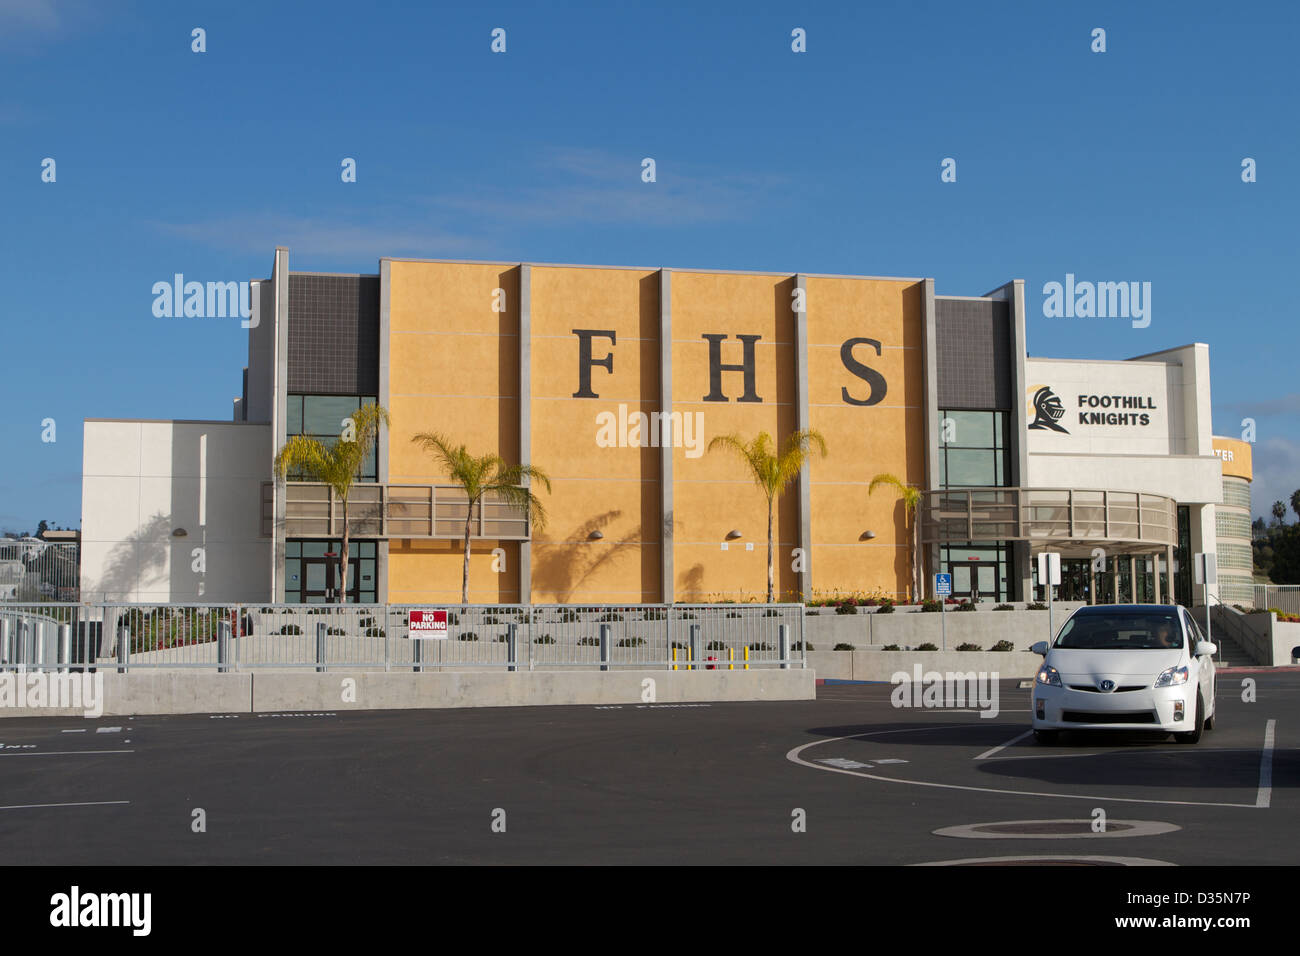 Foothill High School, Santa Ana, California, USA - Stock Image